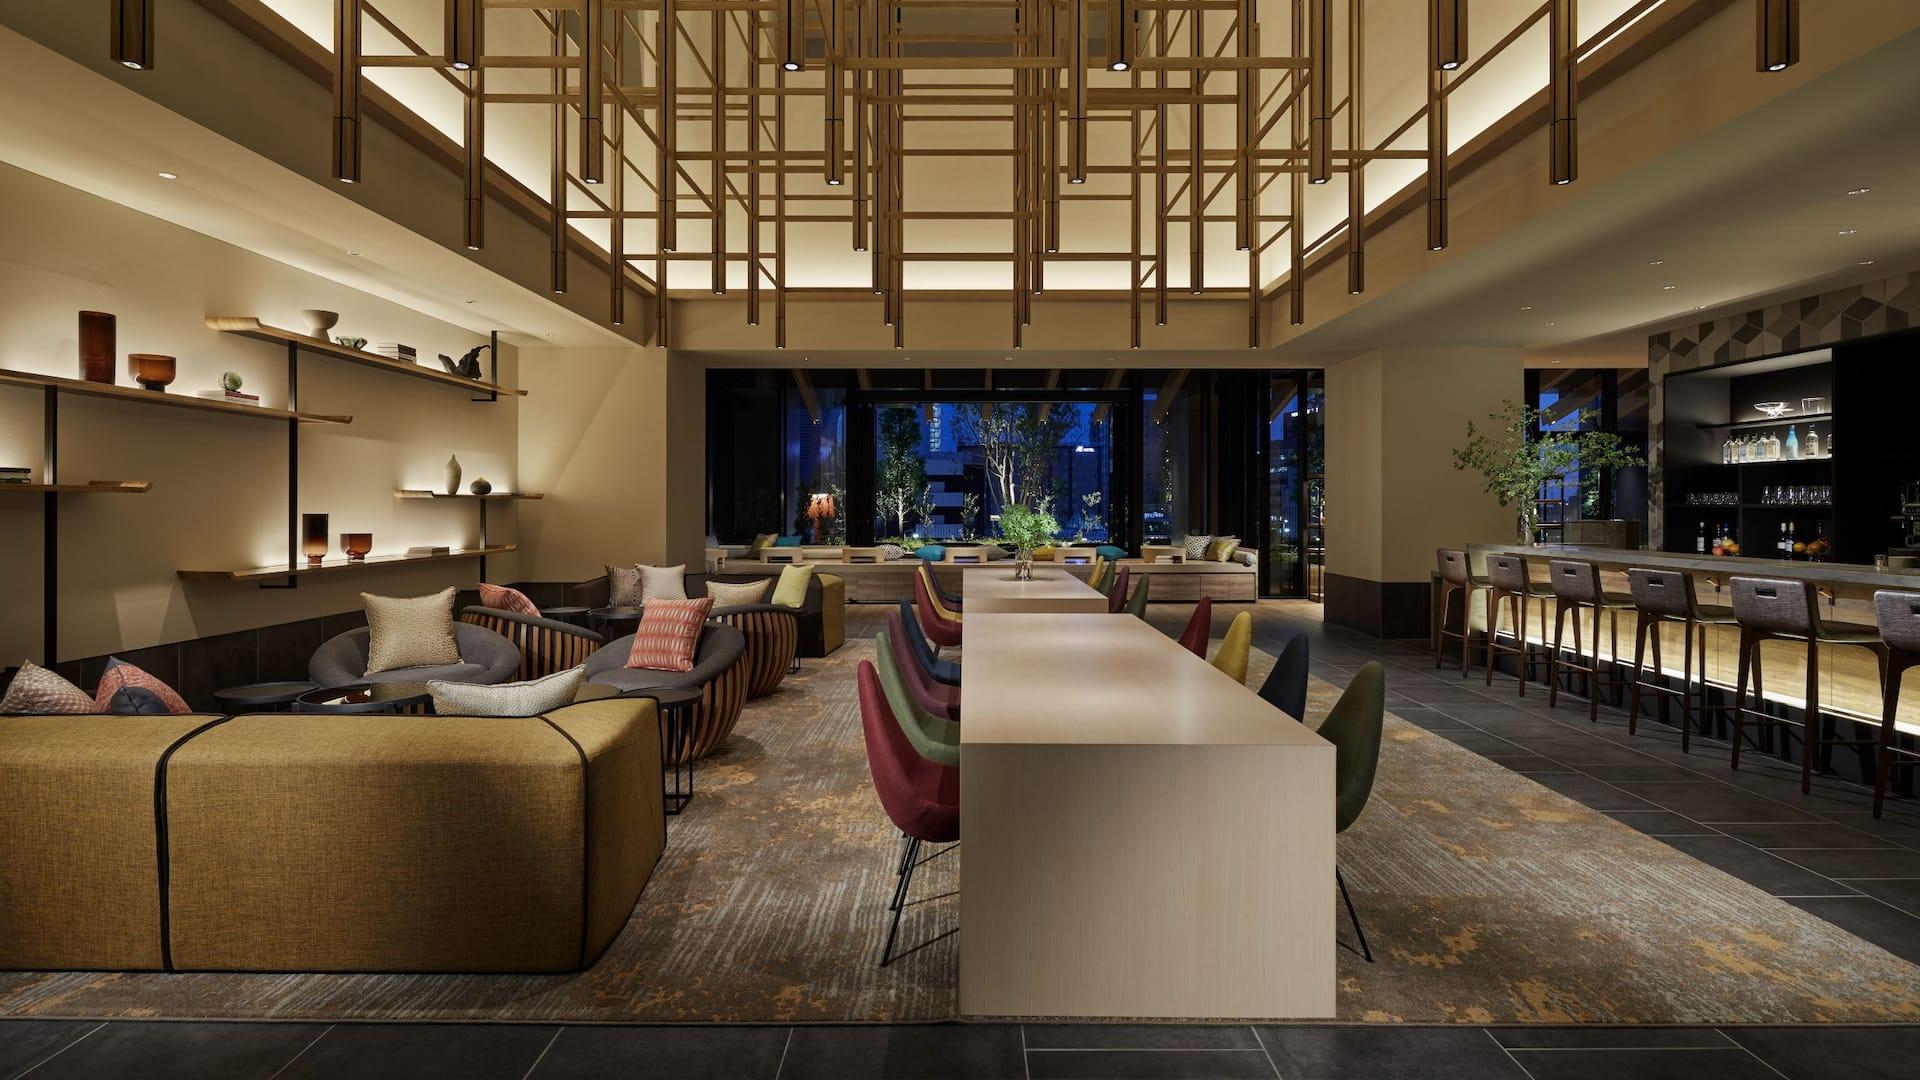 Hyatt House Kanazawa Lobby